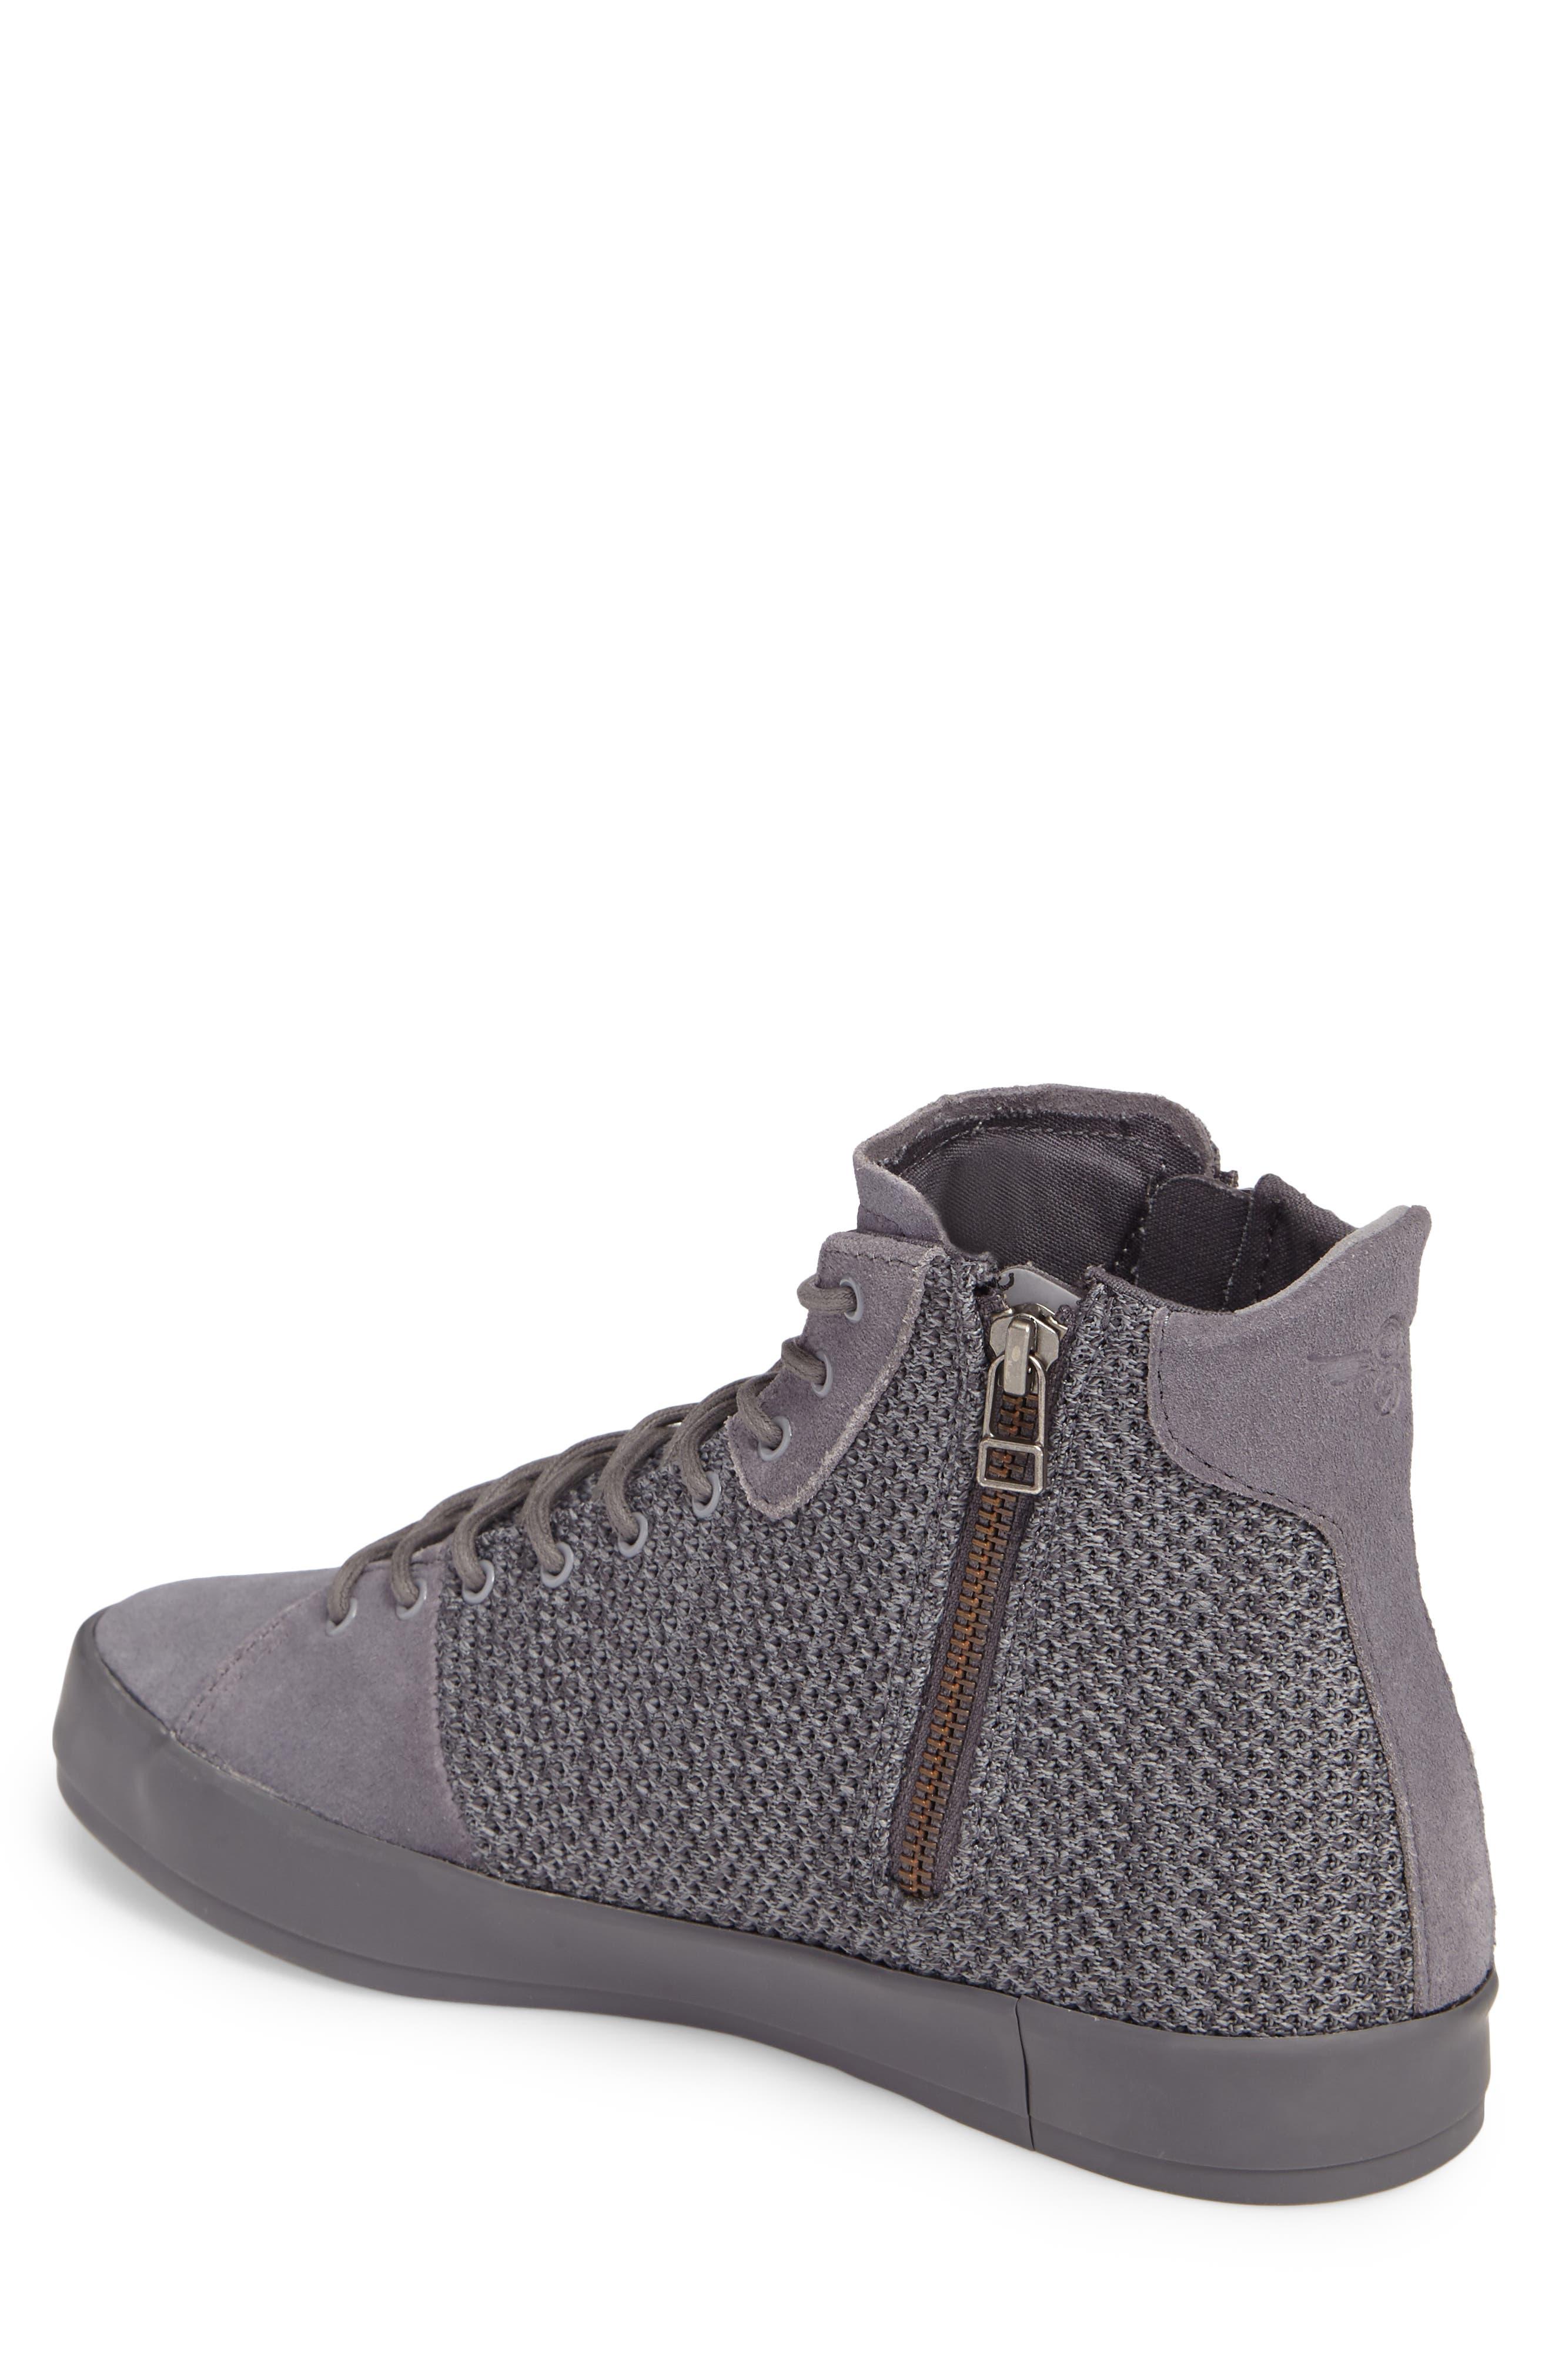 Carda Hi Sneaker,                             Alternate thumbnail 2, color,                             Smoke Leather